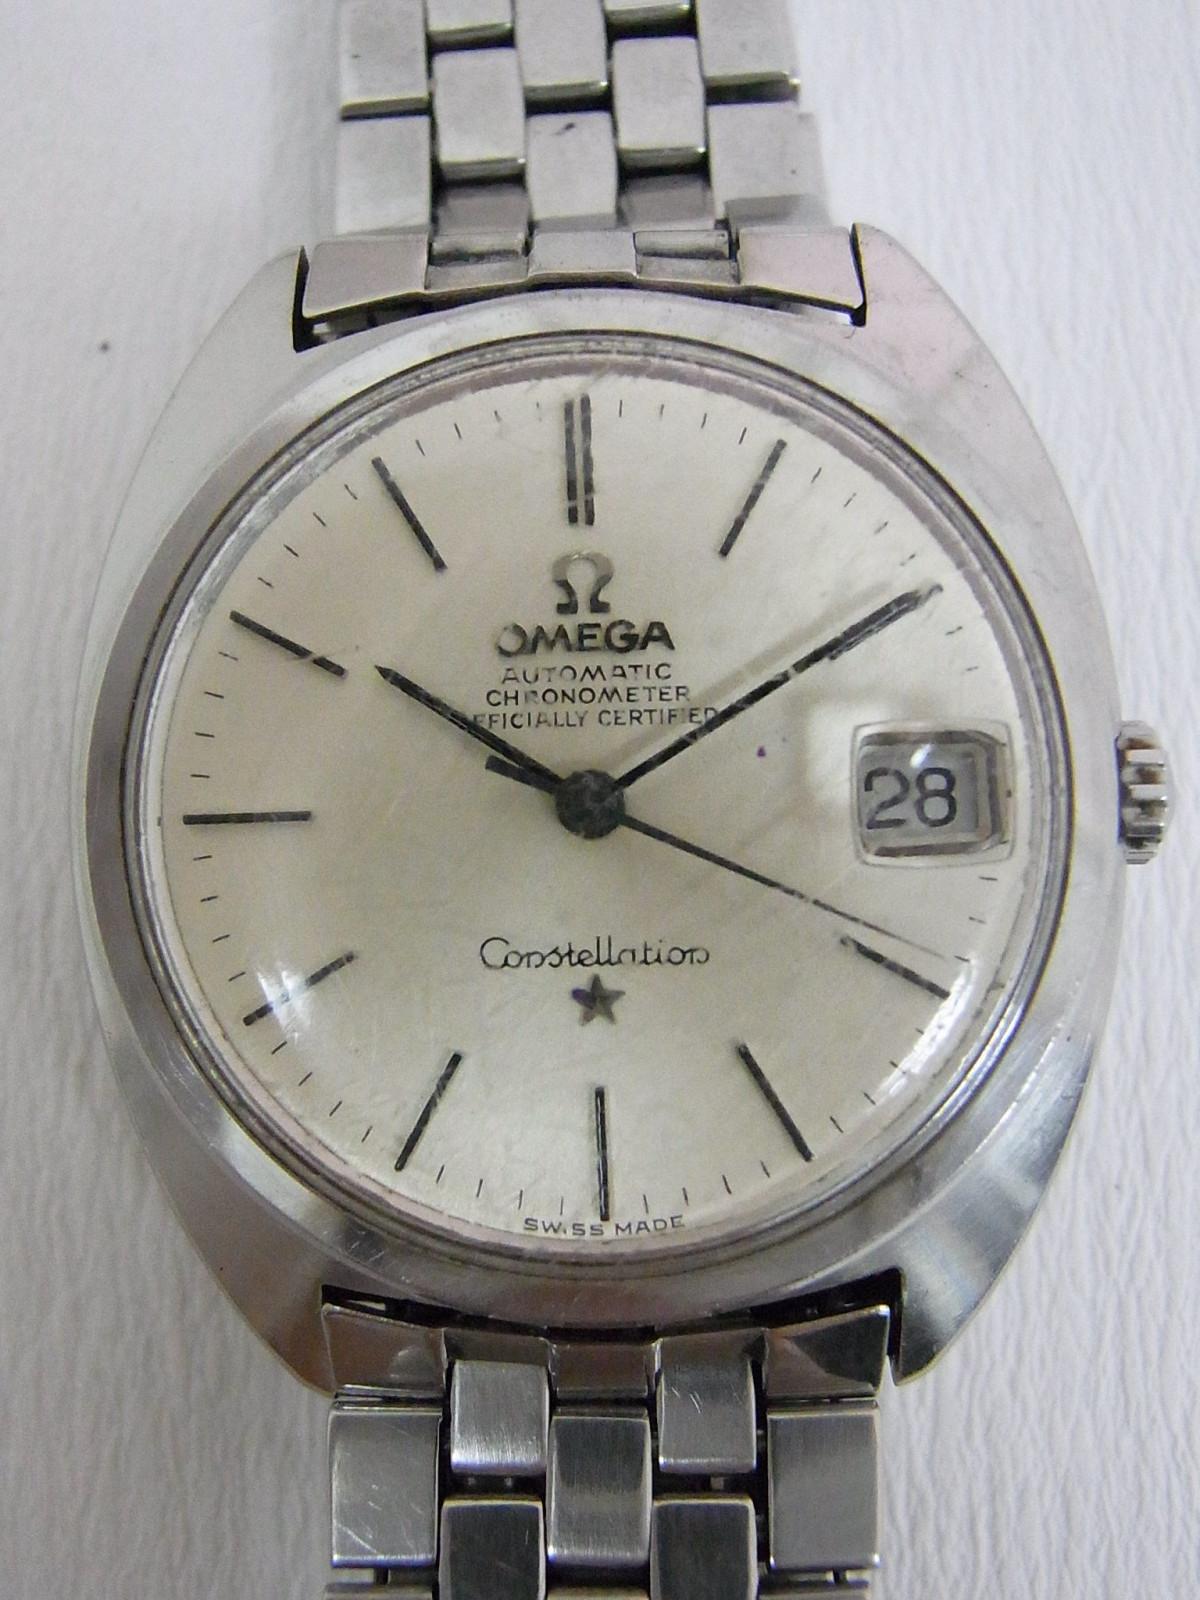 6a63db22a8b Omega Constellation relógio usados (€24) - Timepeaks